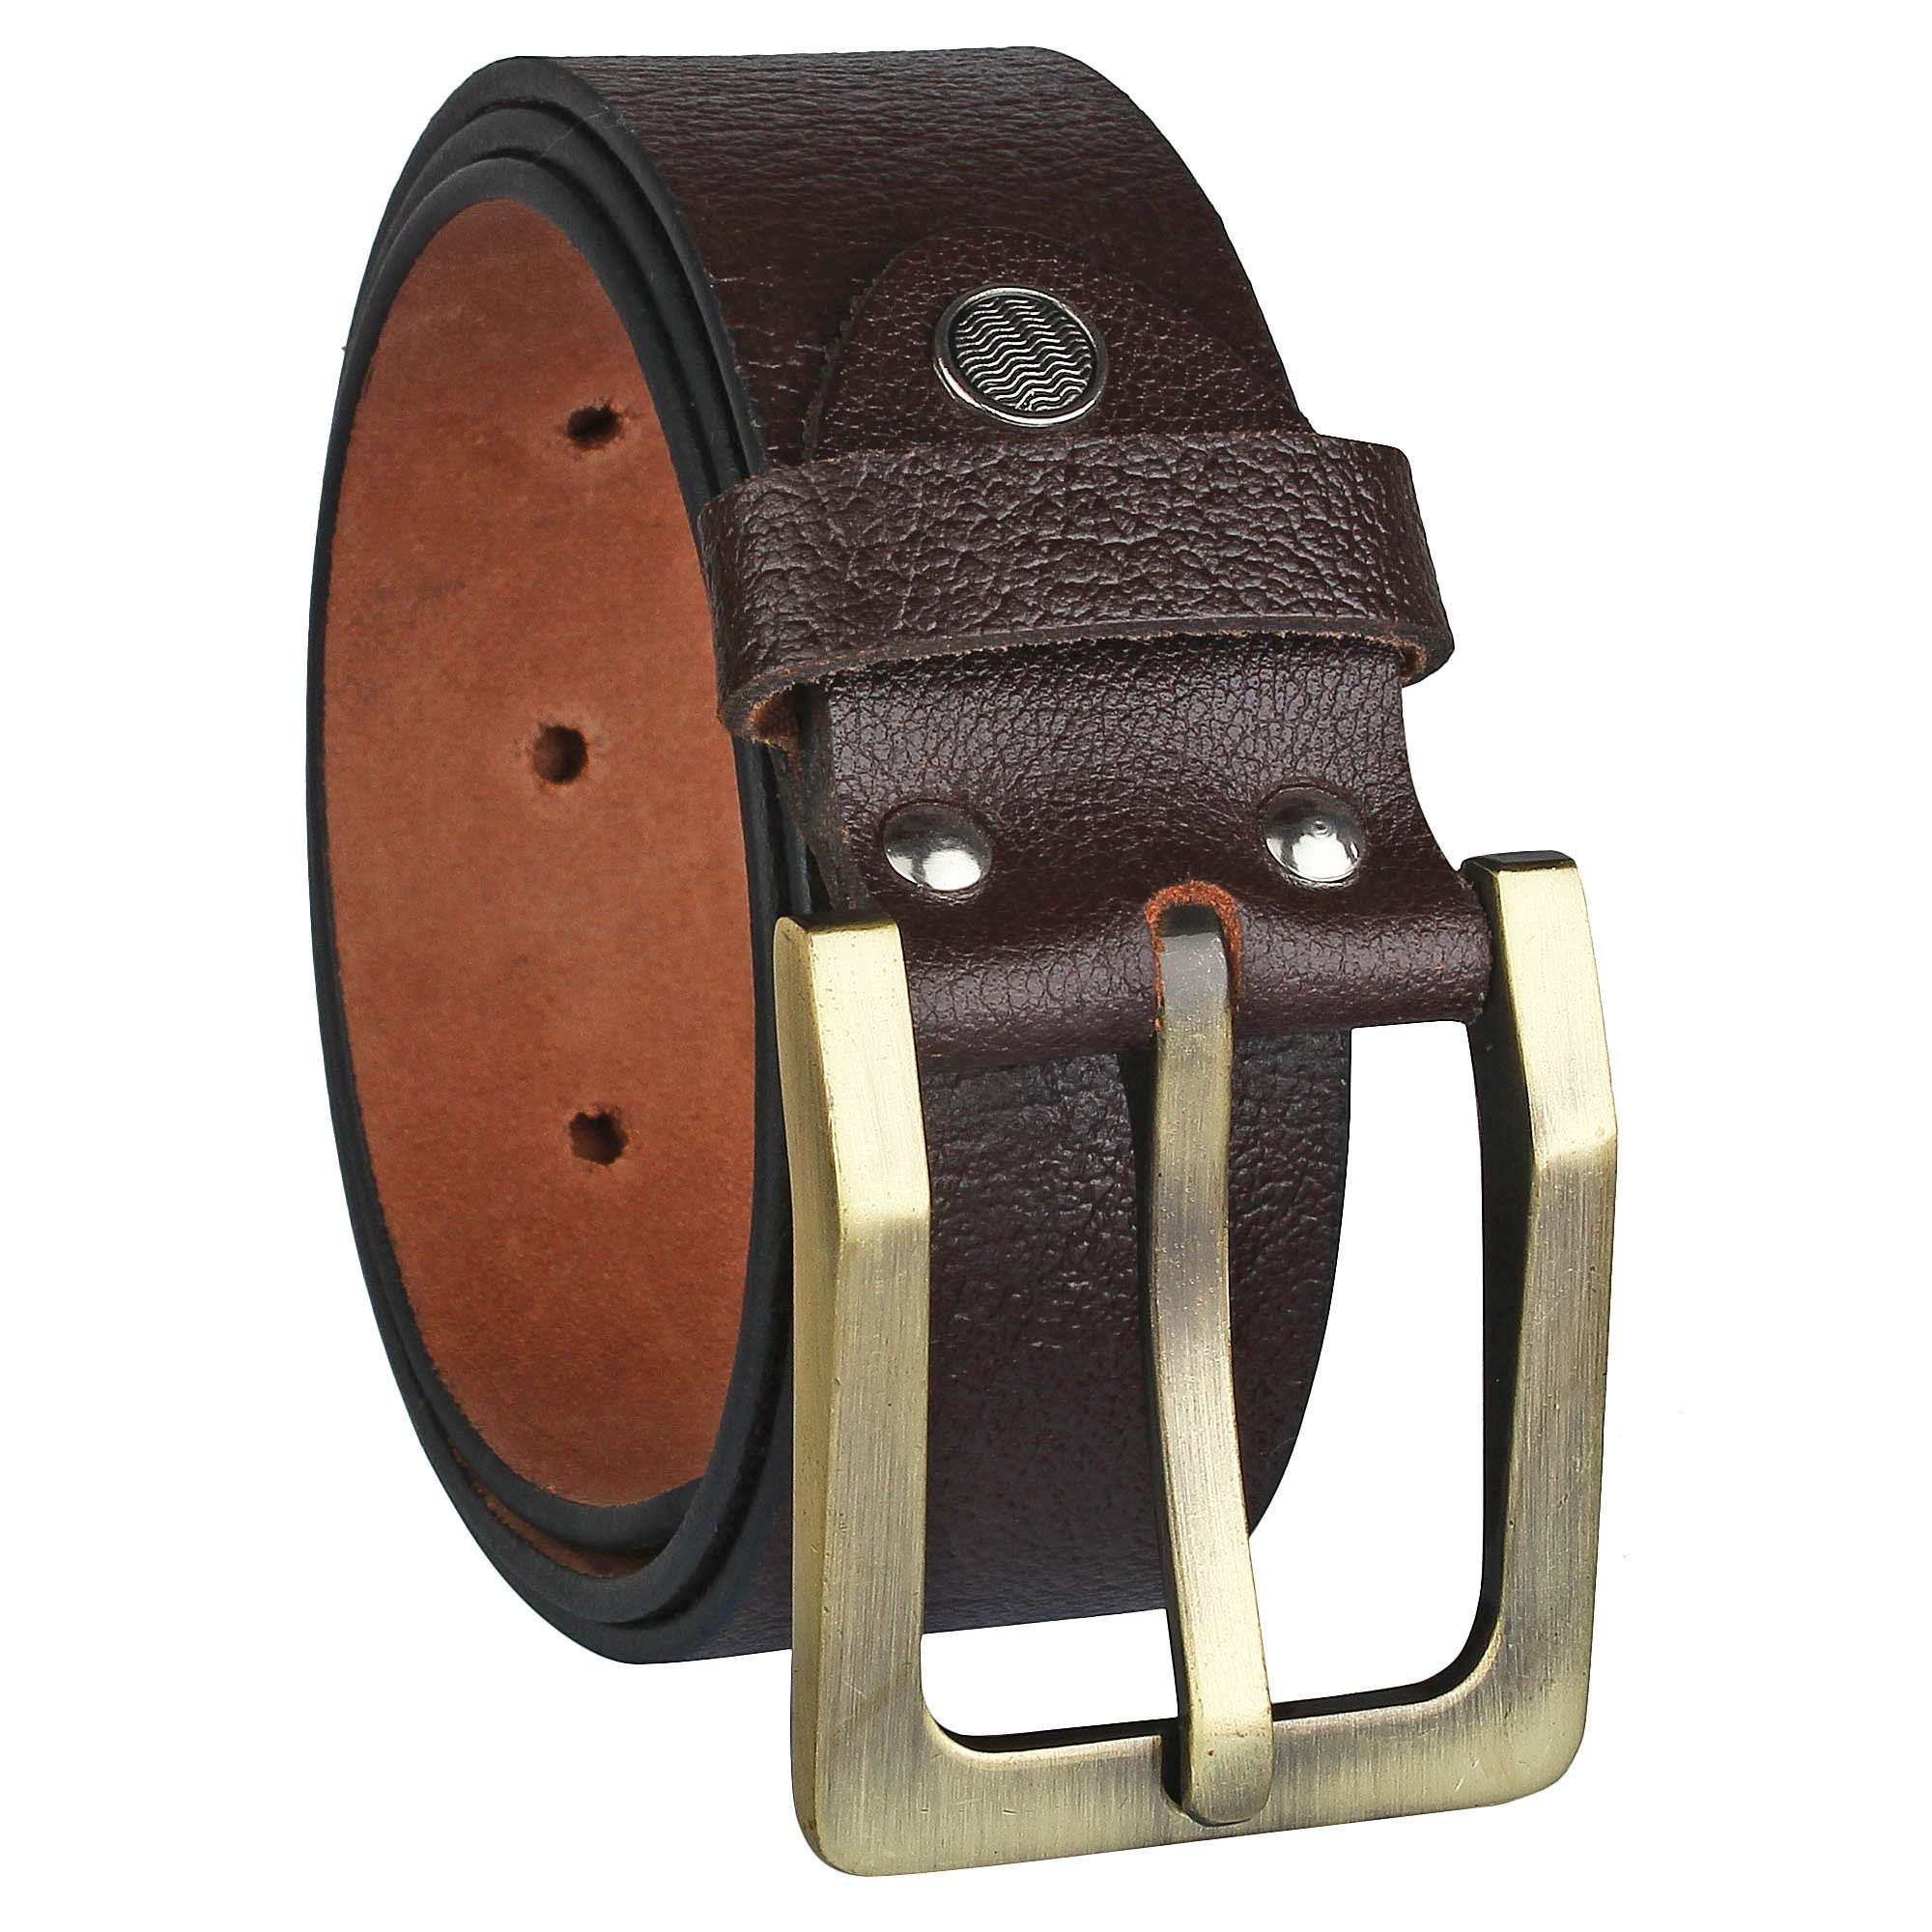 Dritz Iron On Patches 5X5 2//Pkg Khaki Twill 55240-58T Bulk Buy 6-Pack